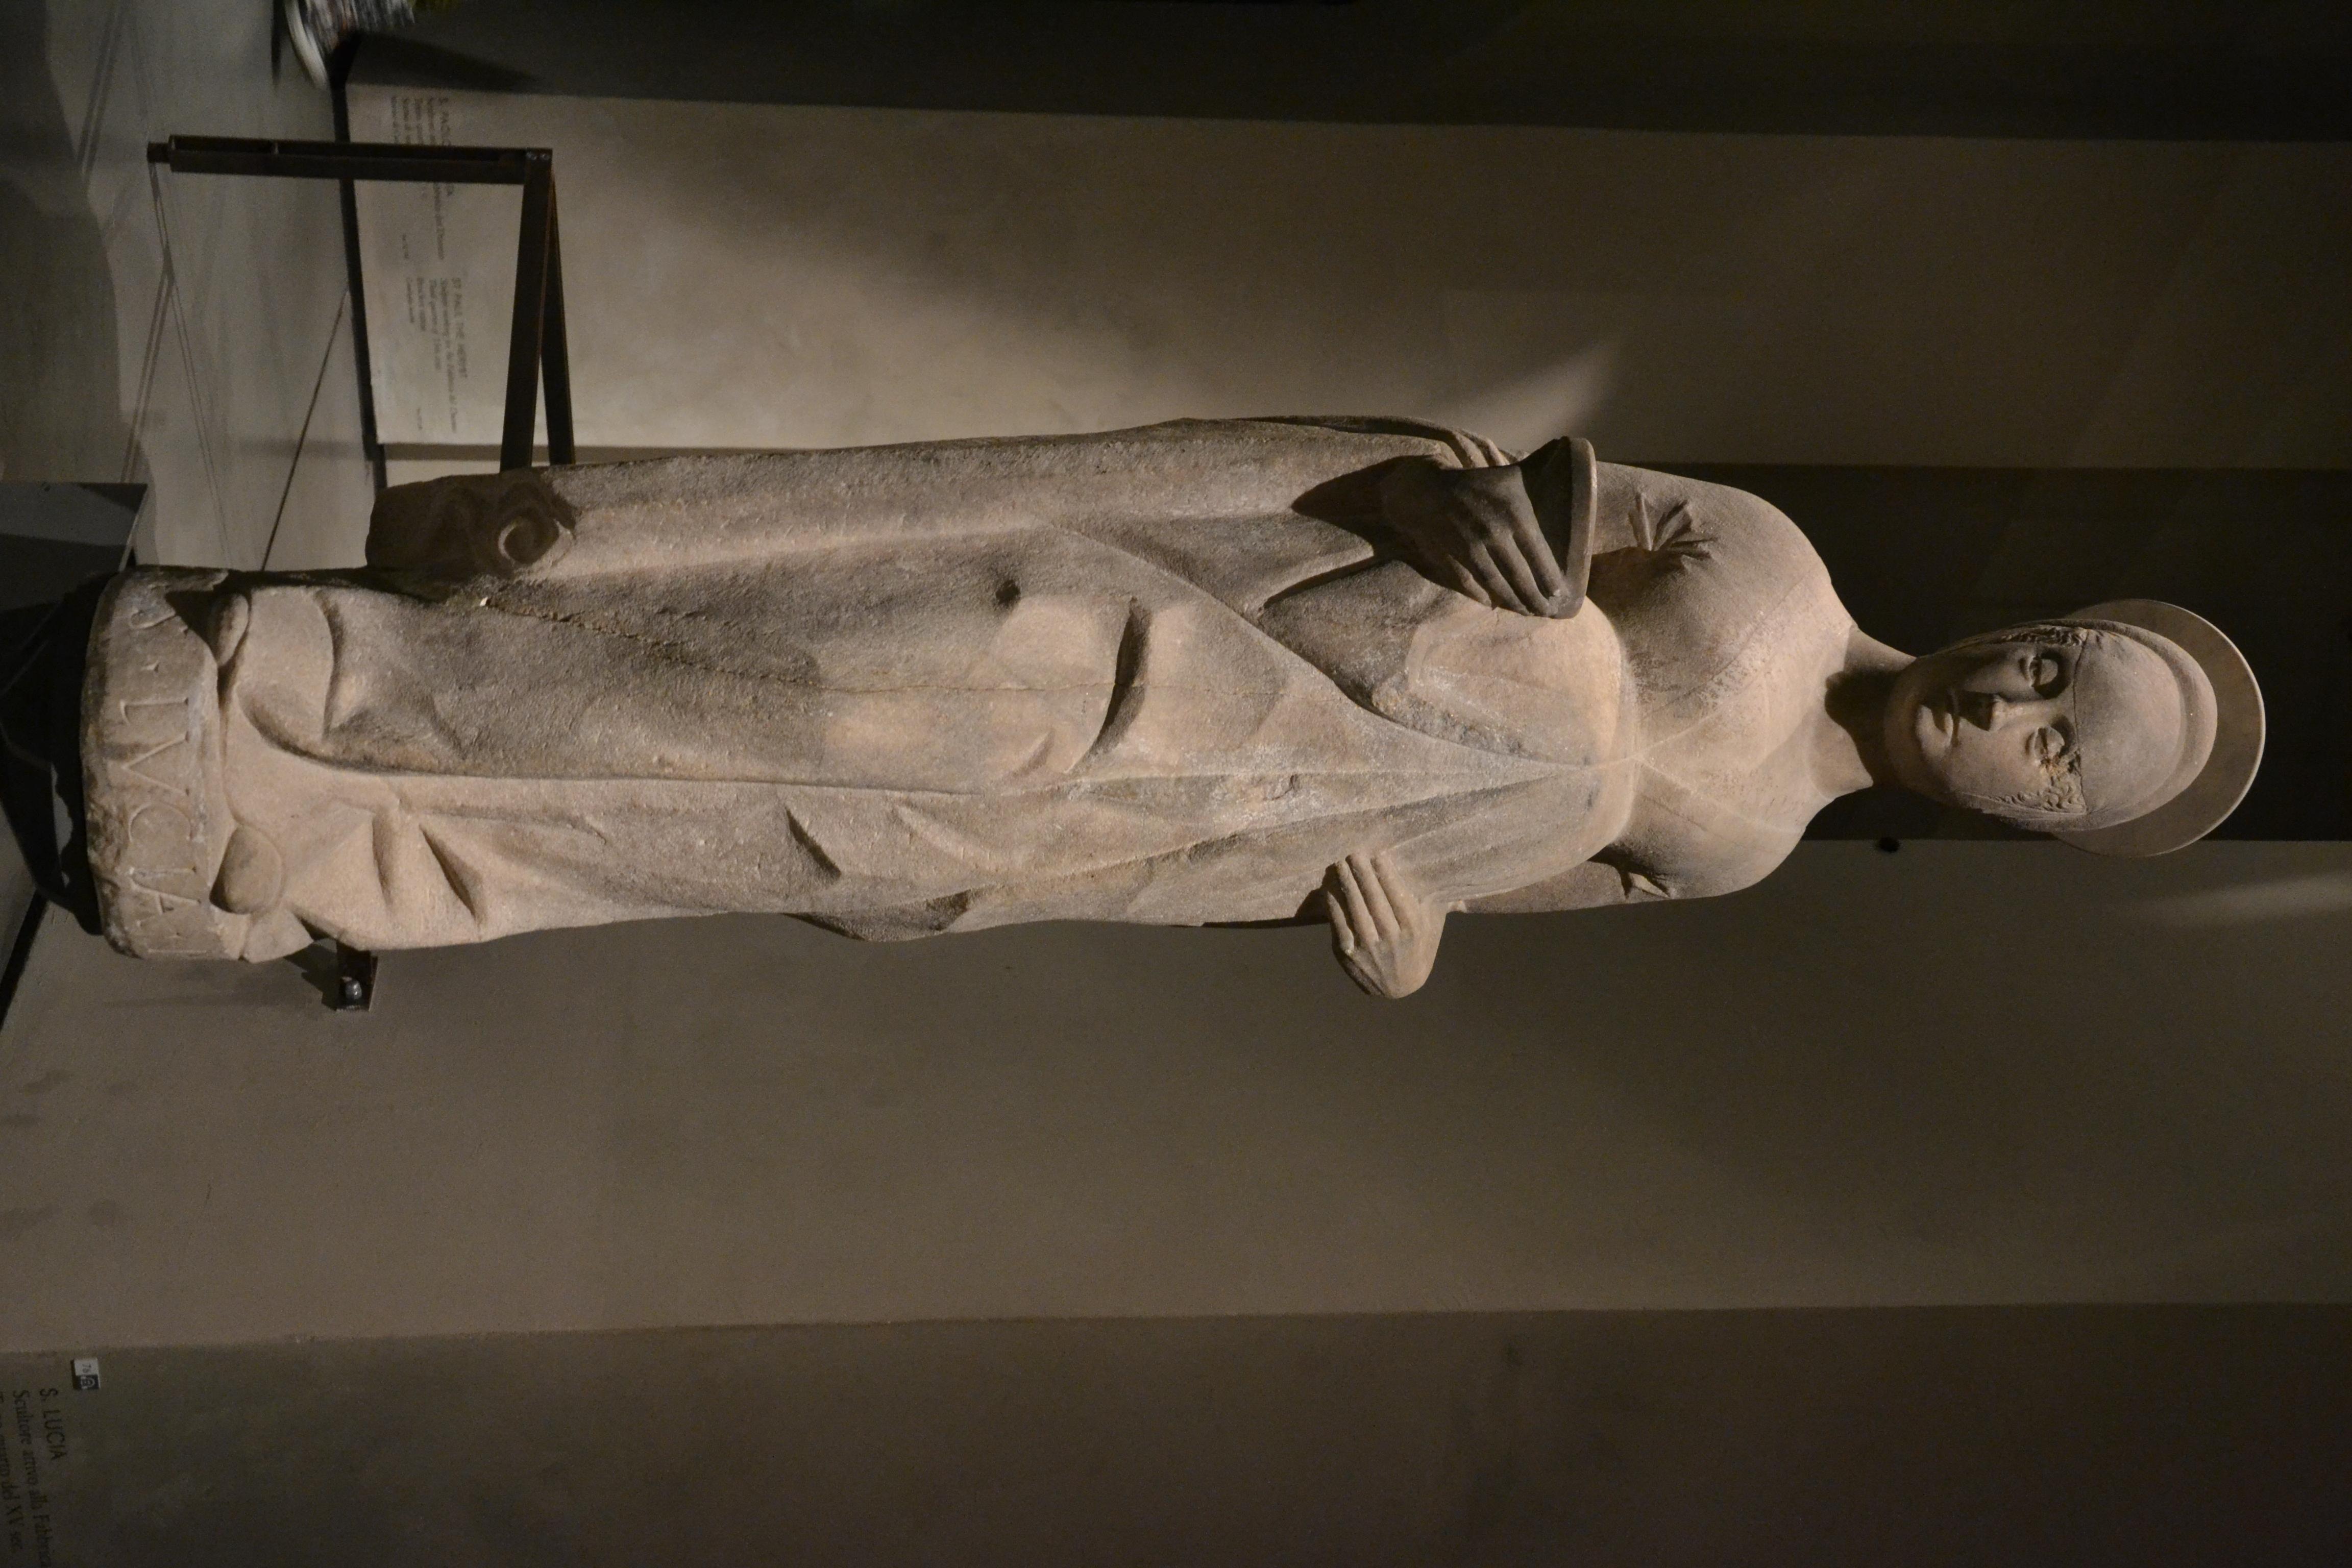 https://upload.wikimedia.org/wikipedia/commons/b/b9/Santa_Lucia%2C_Museo_del_Duomo_di_Milano_09.jpg